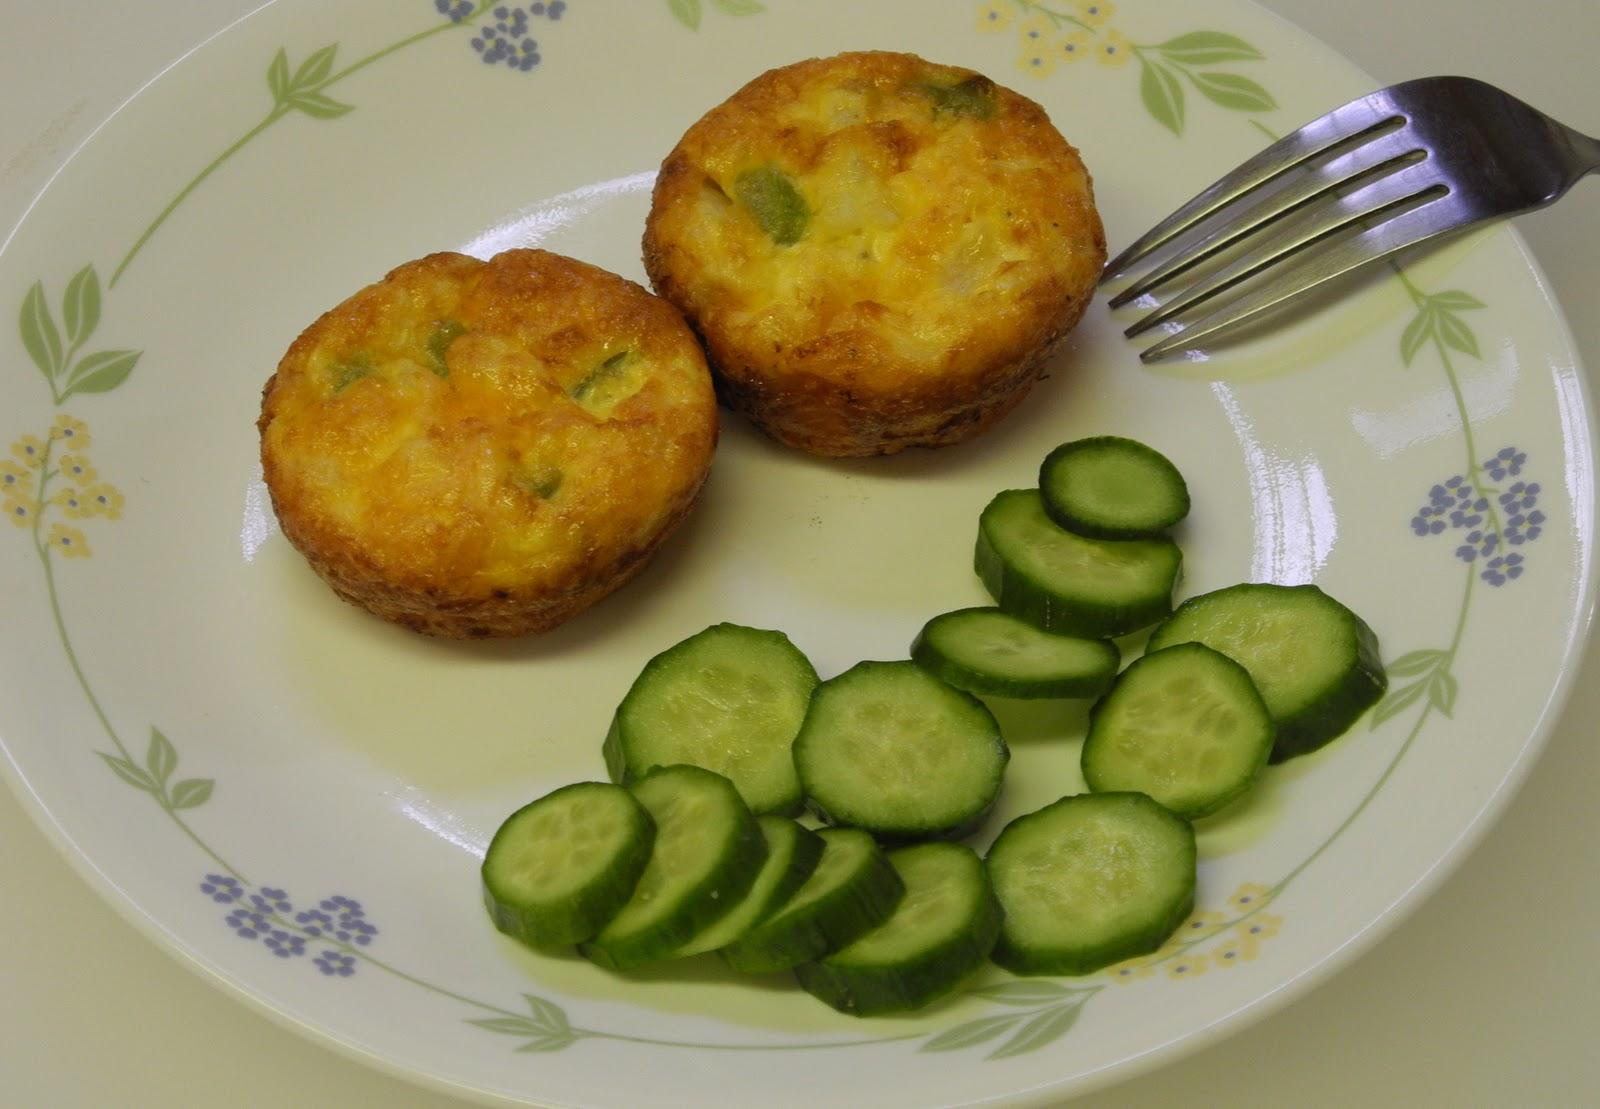 BIZZY BAKES: Muffin Mondays - Scrambled Egg Muffins